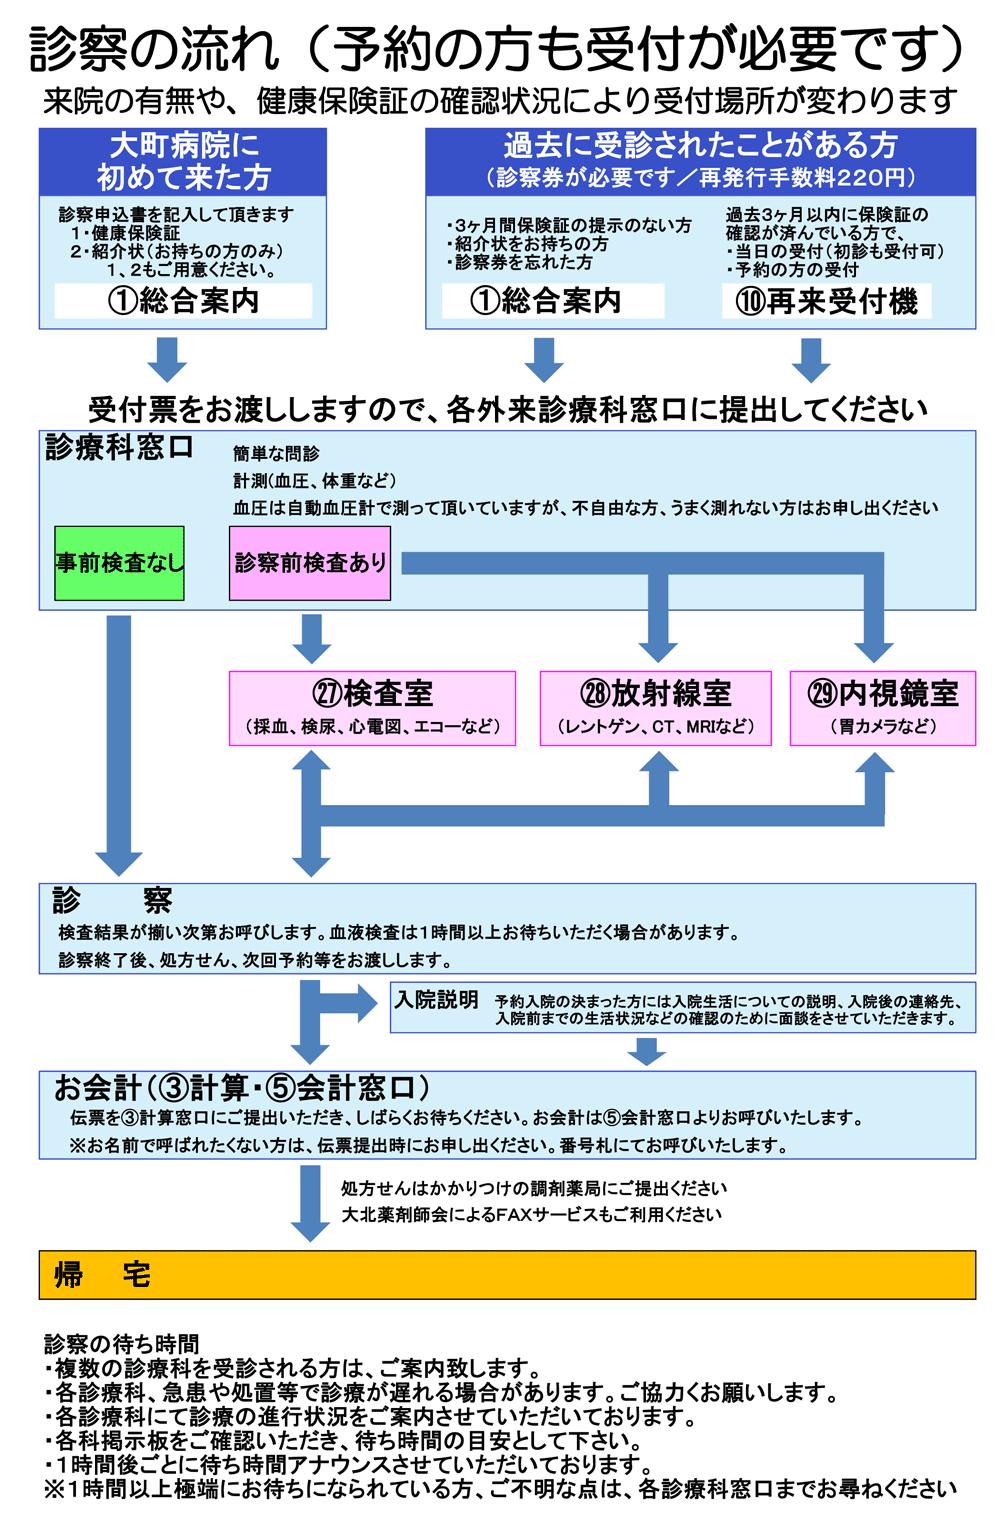 https://www.omachi-hospital.jp/visit/outpatient/Flow-of-examinations.png